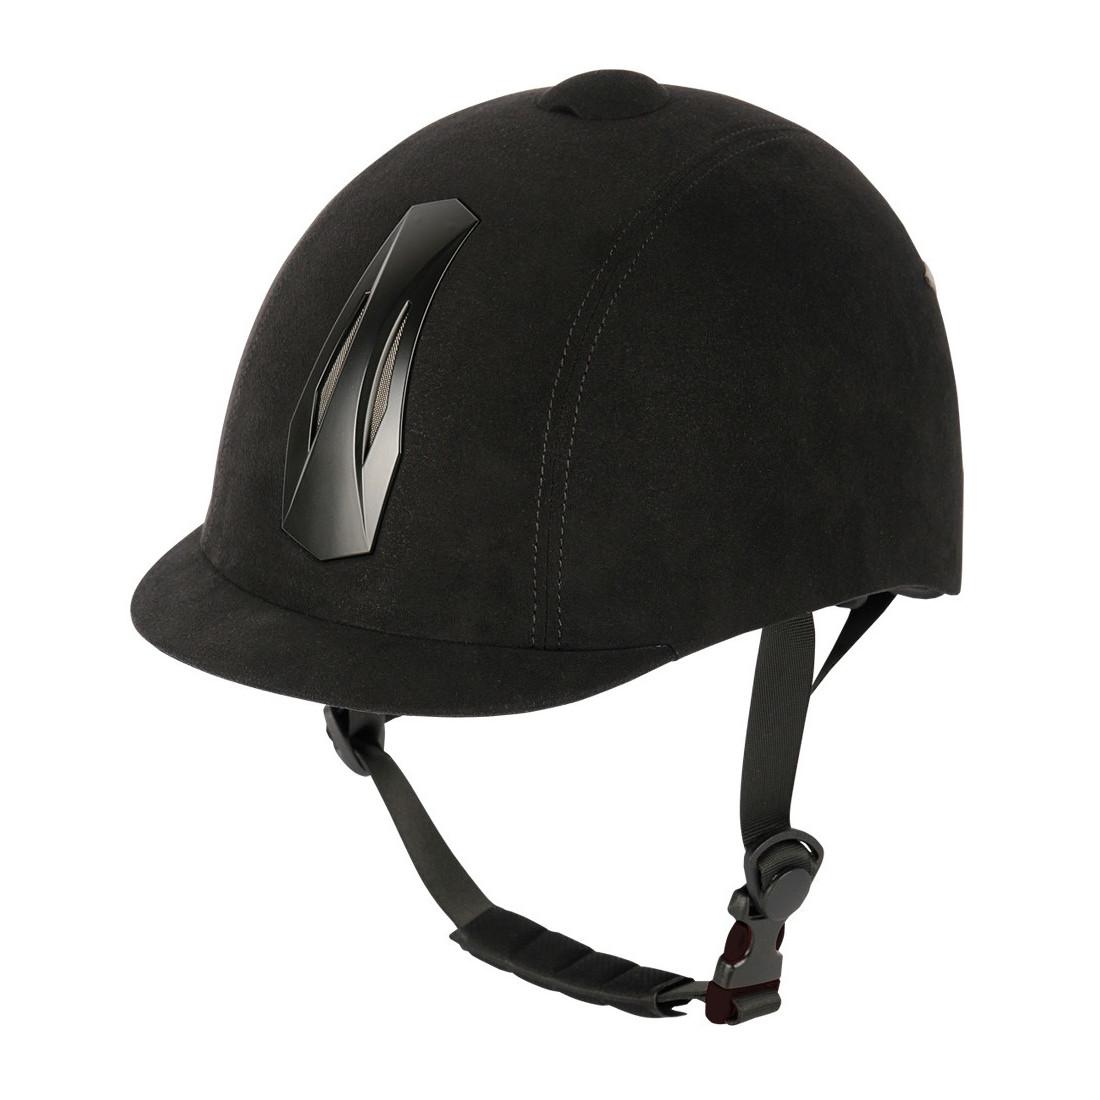 Harry's Horse Sicherheitsreithelm Pro One